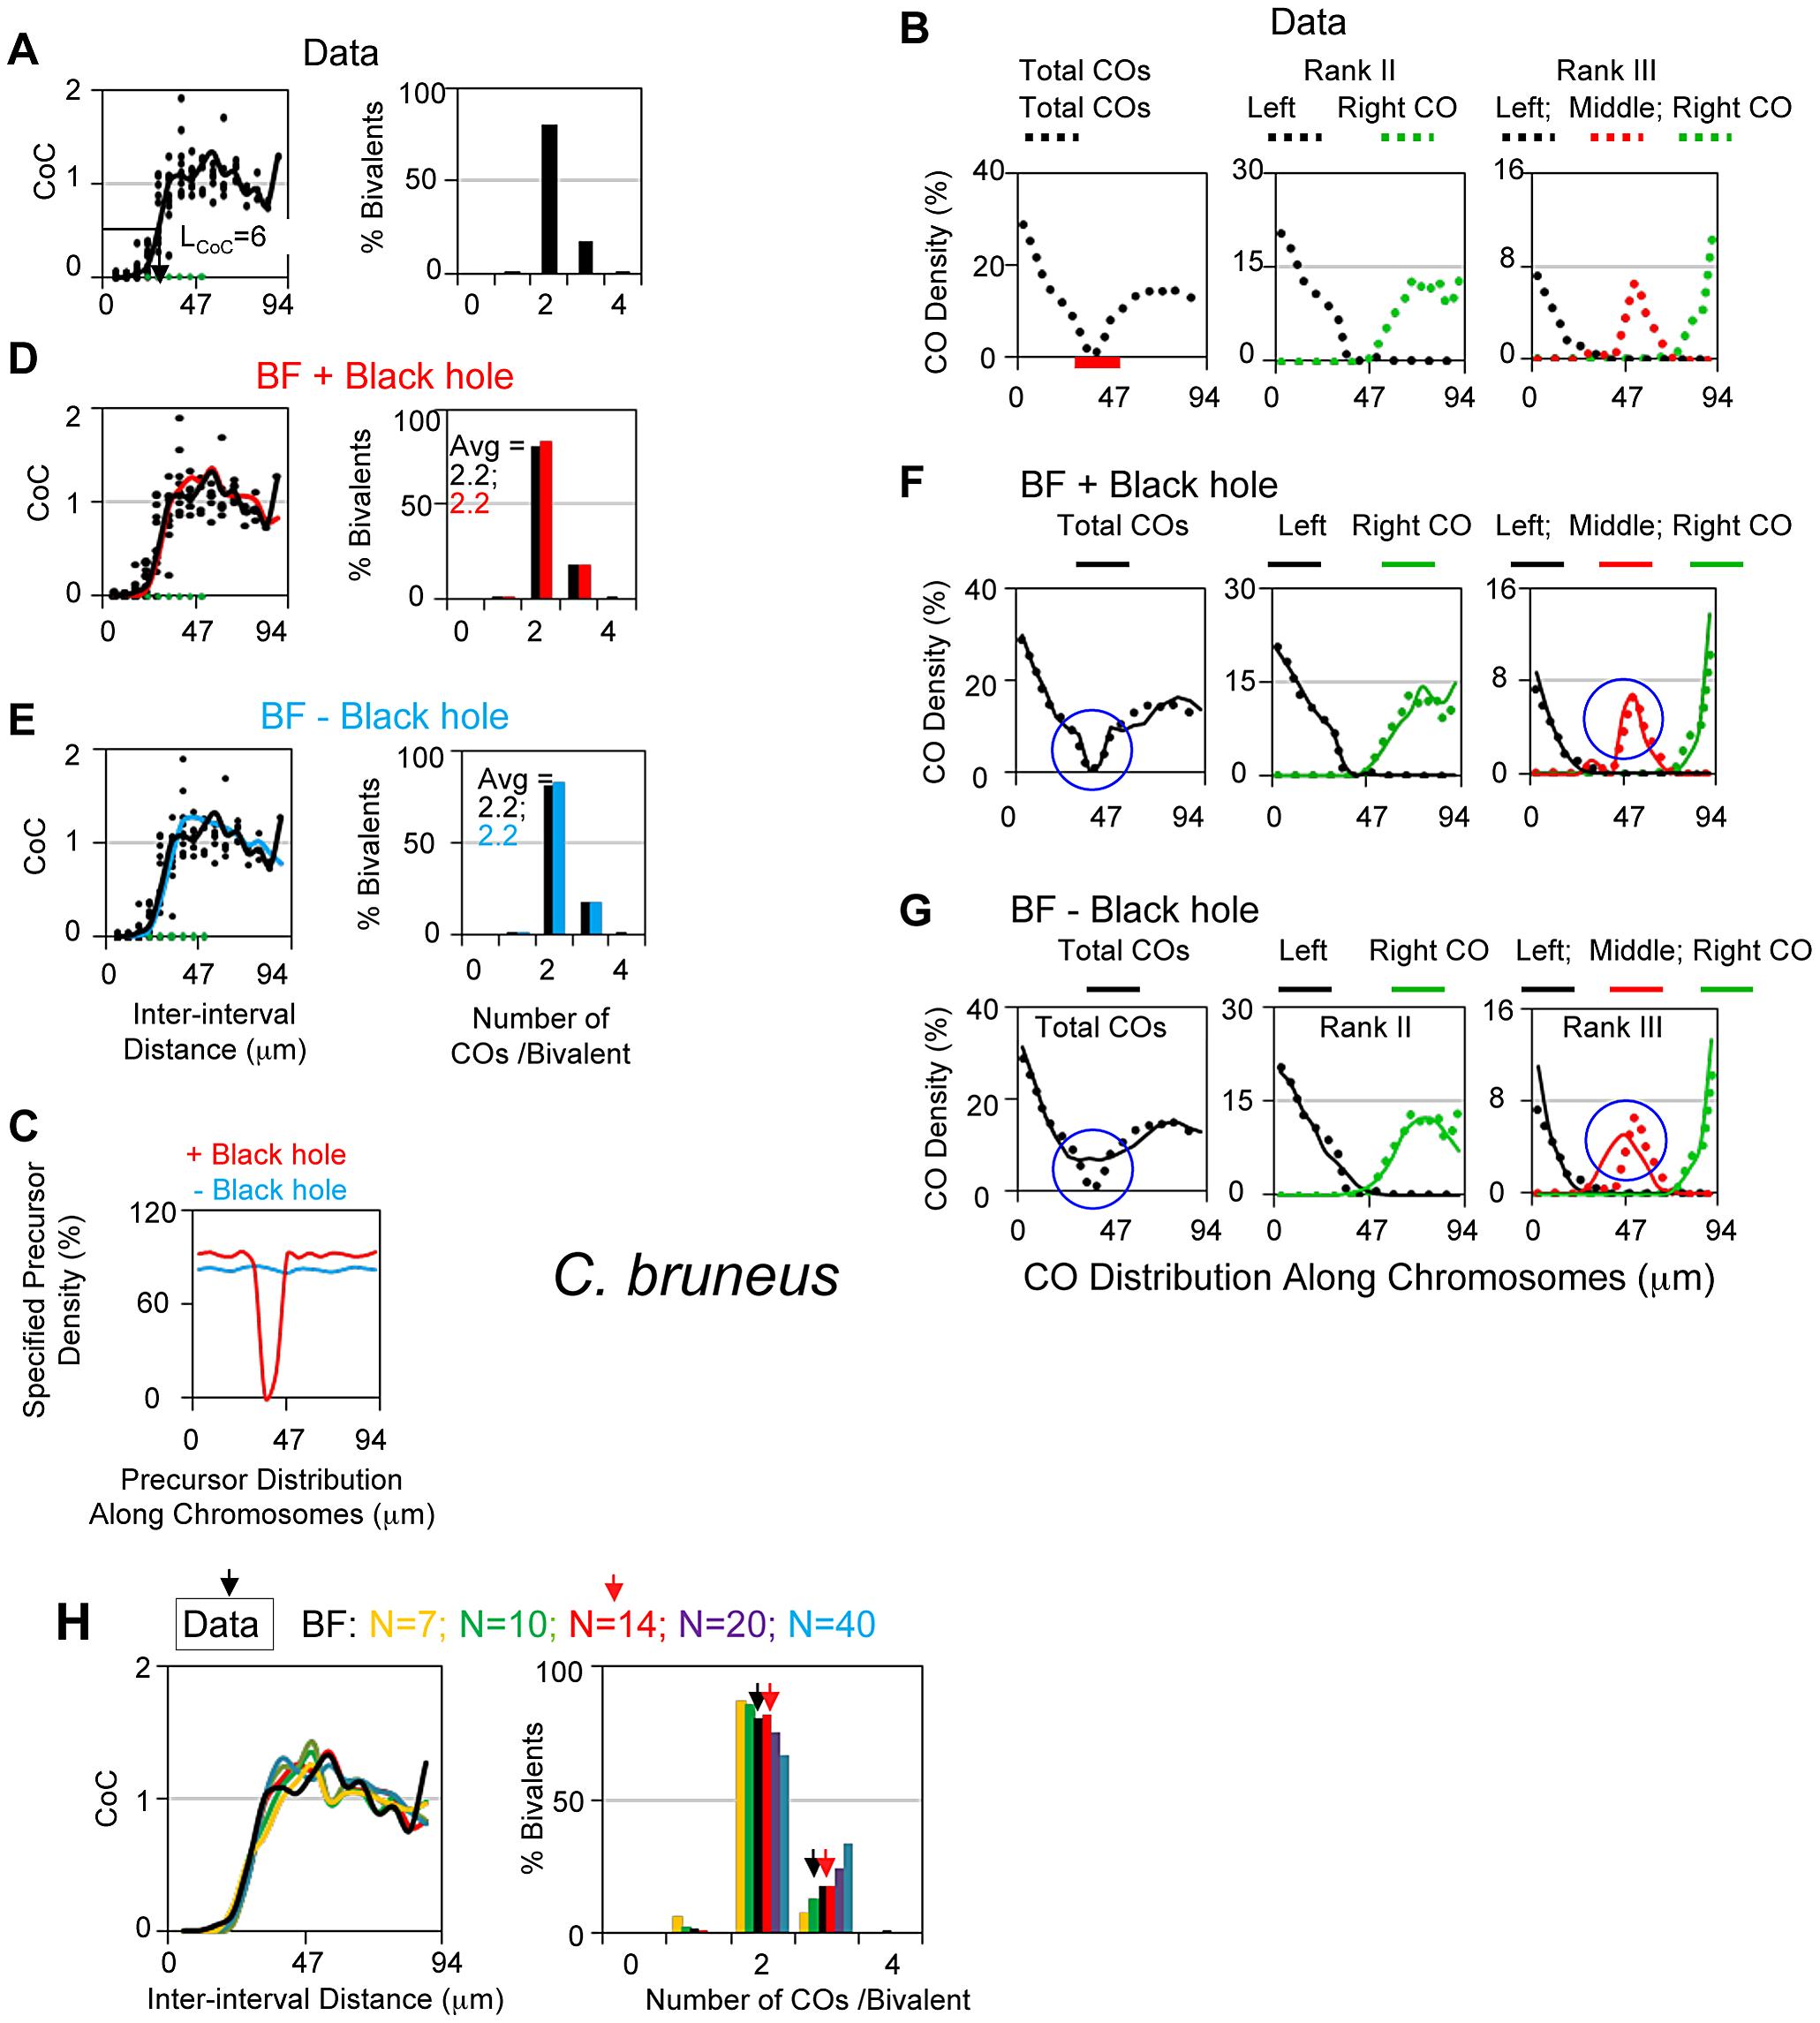 Experimental and BF analysis of CO patterns in grasshopper (<i>Chorthippus bruneus</i>).